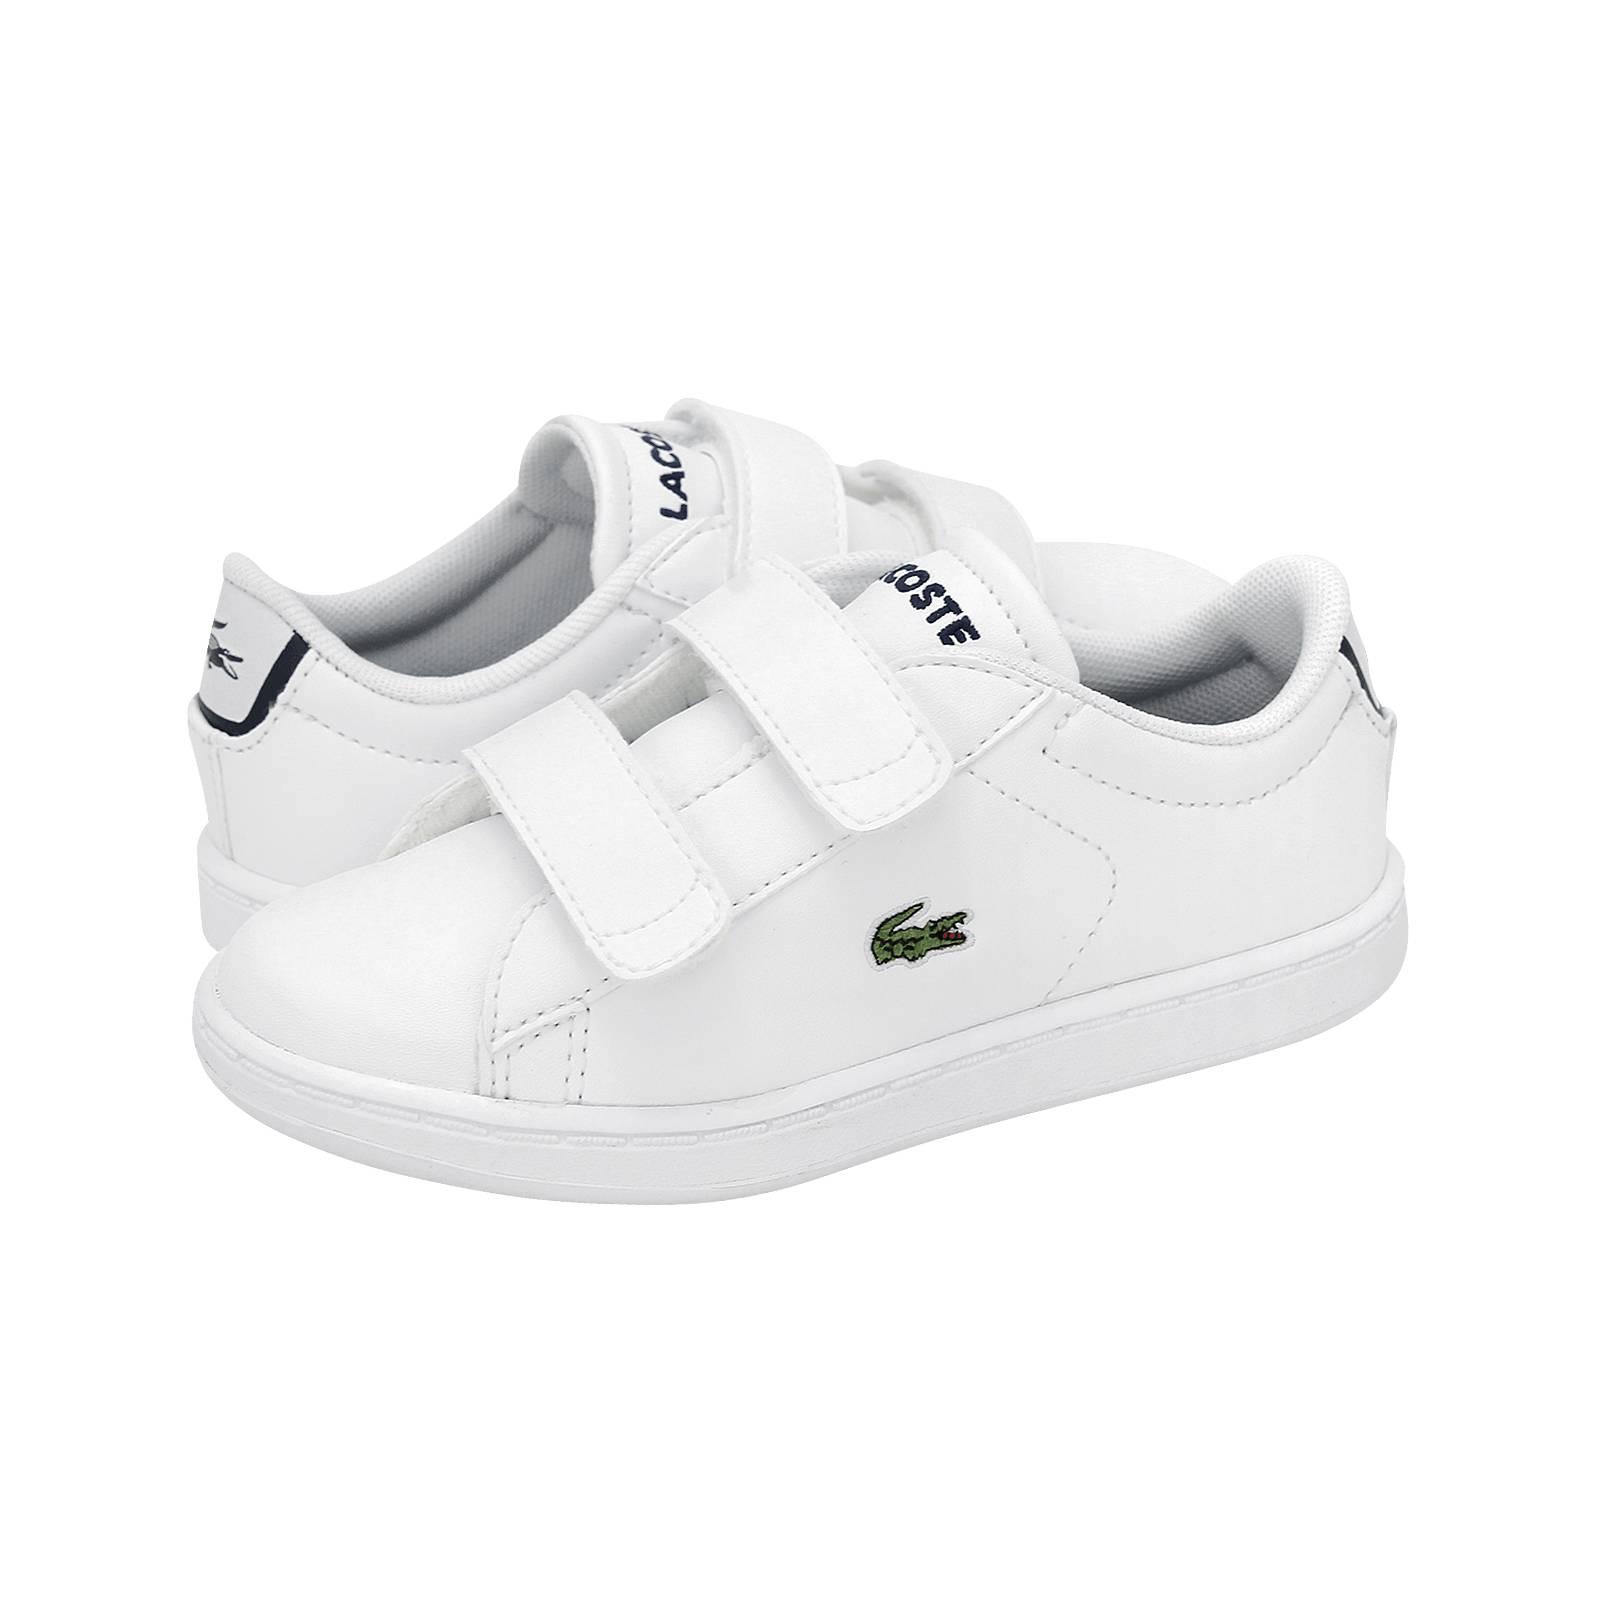 Carnaby Evo BL 1 - Παιδικά παπούτσια casual Lacoste από δερμα ... e3f3492858d